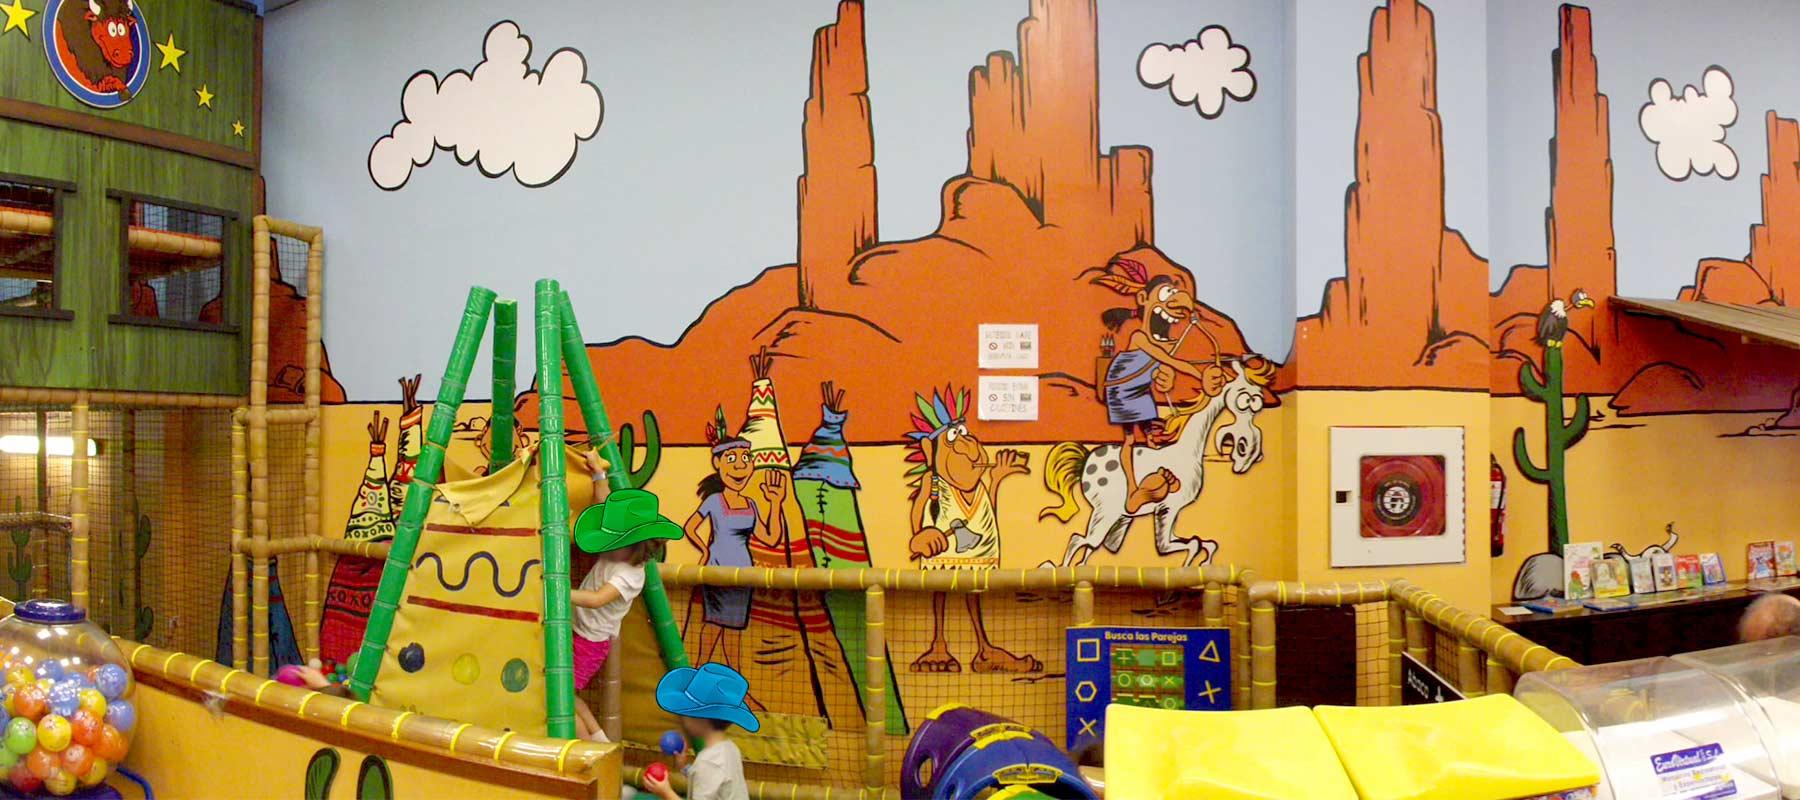 Territorio Dakota parque infantil para cumpleaños, txikipark